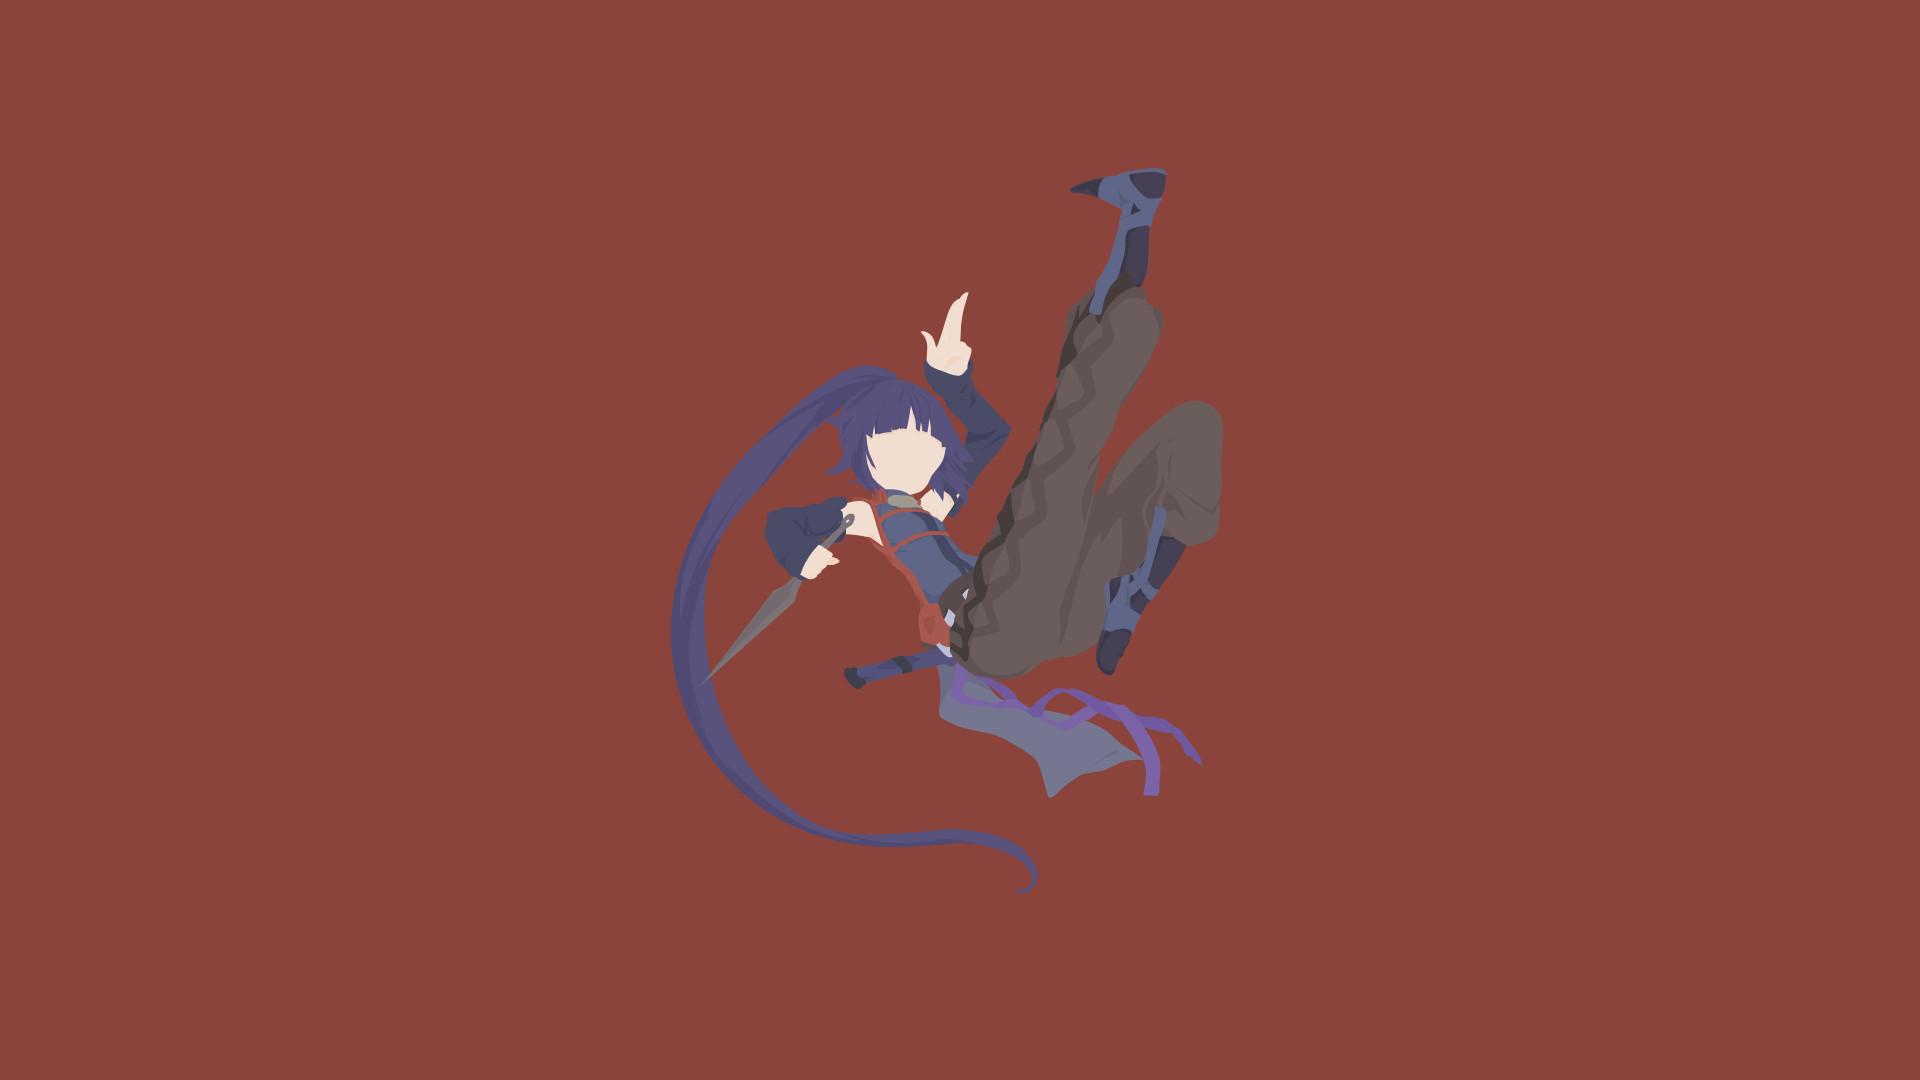 … Akatsuki V2 || Log Horizon by Royal-Jelly